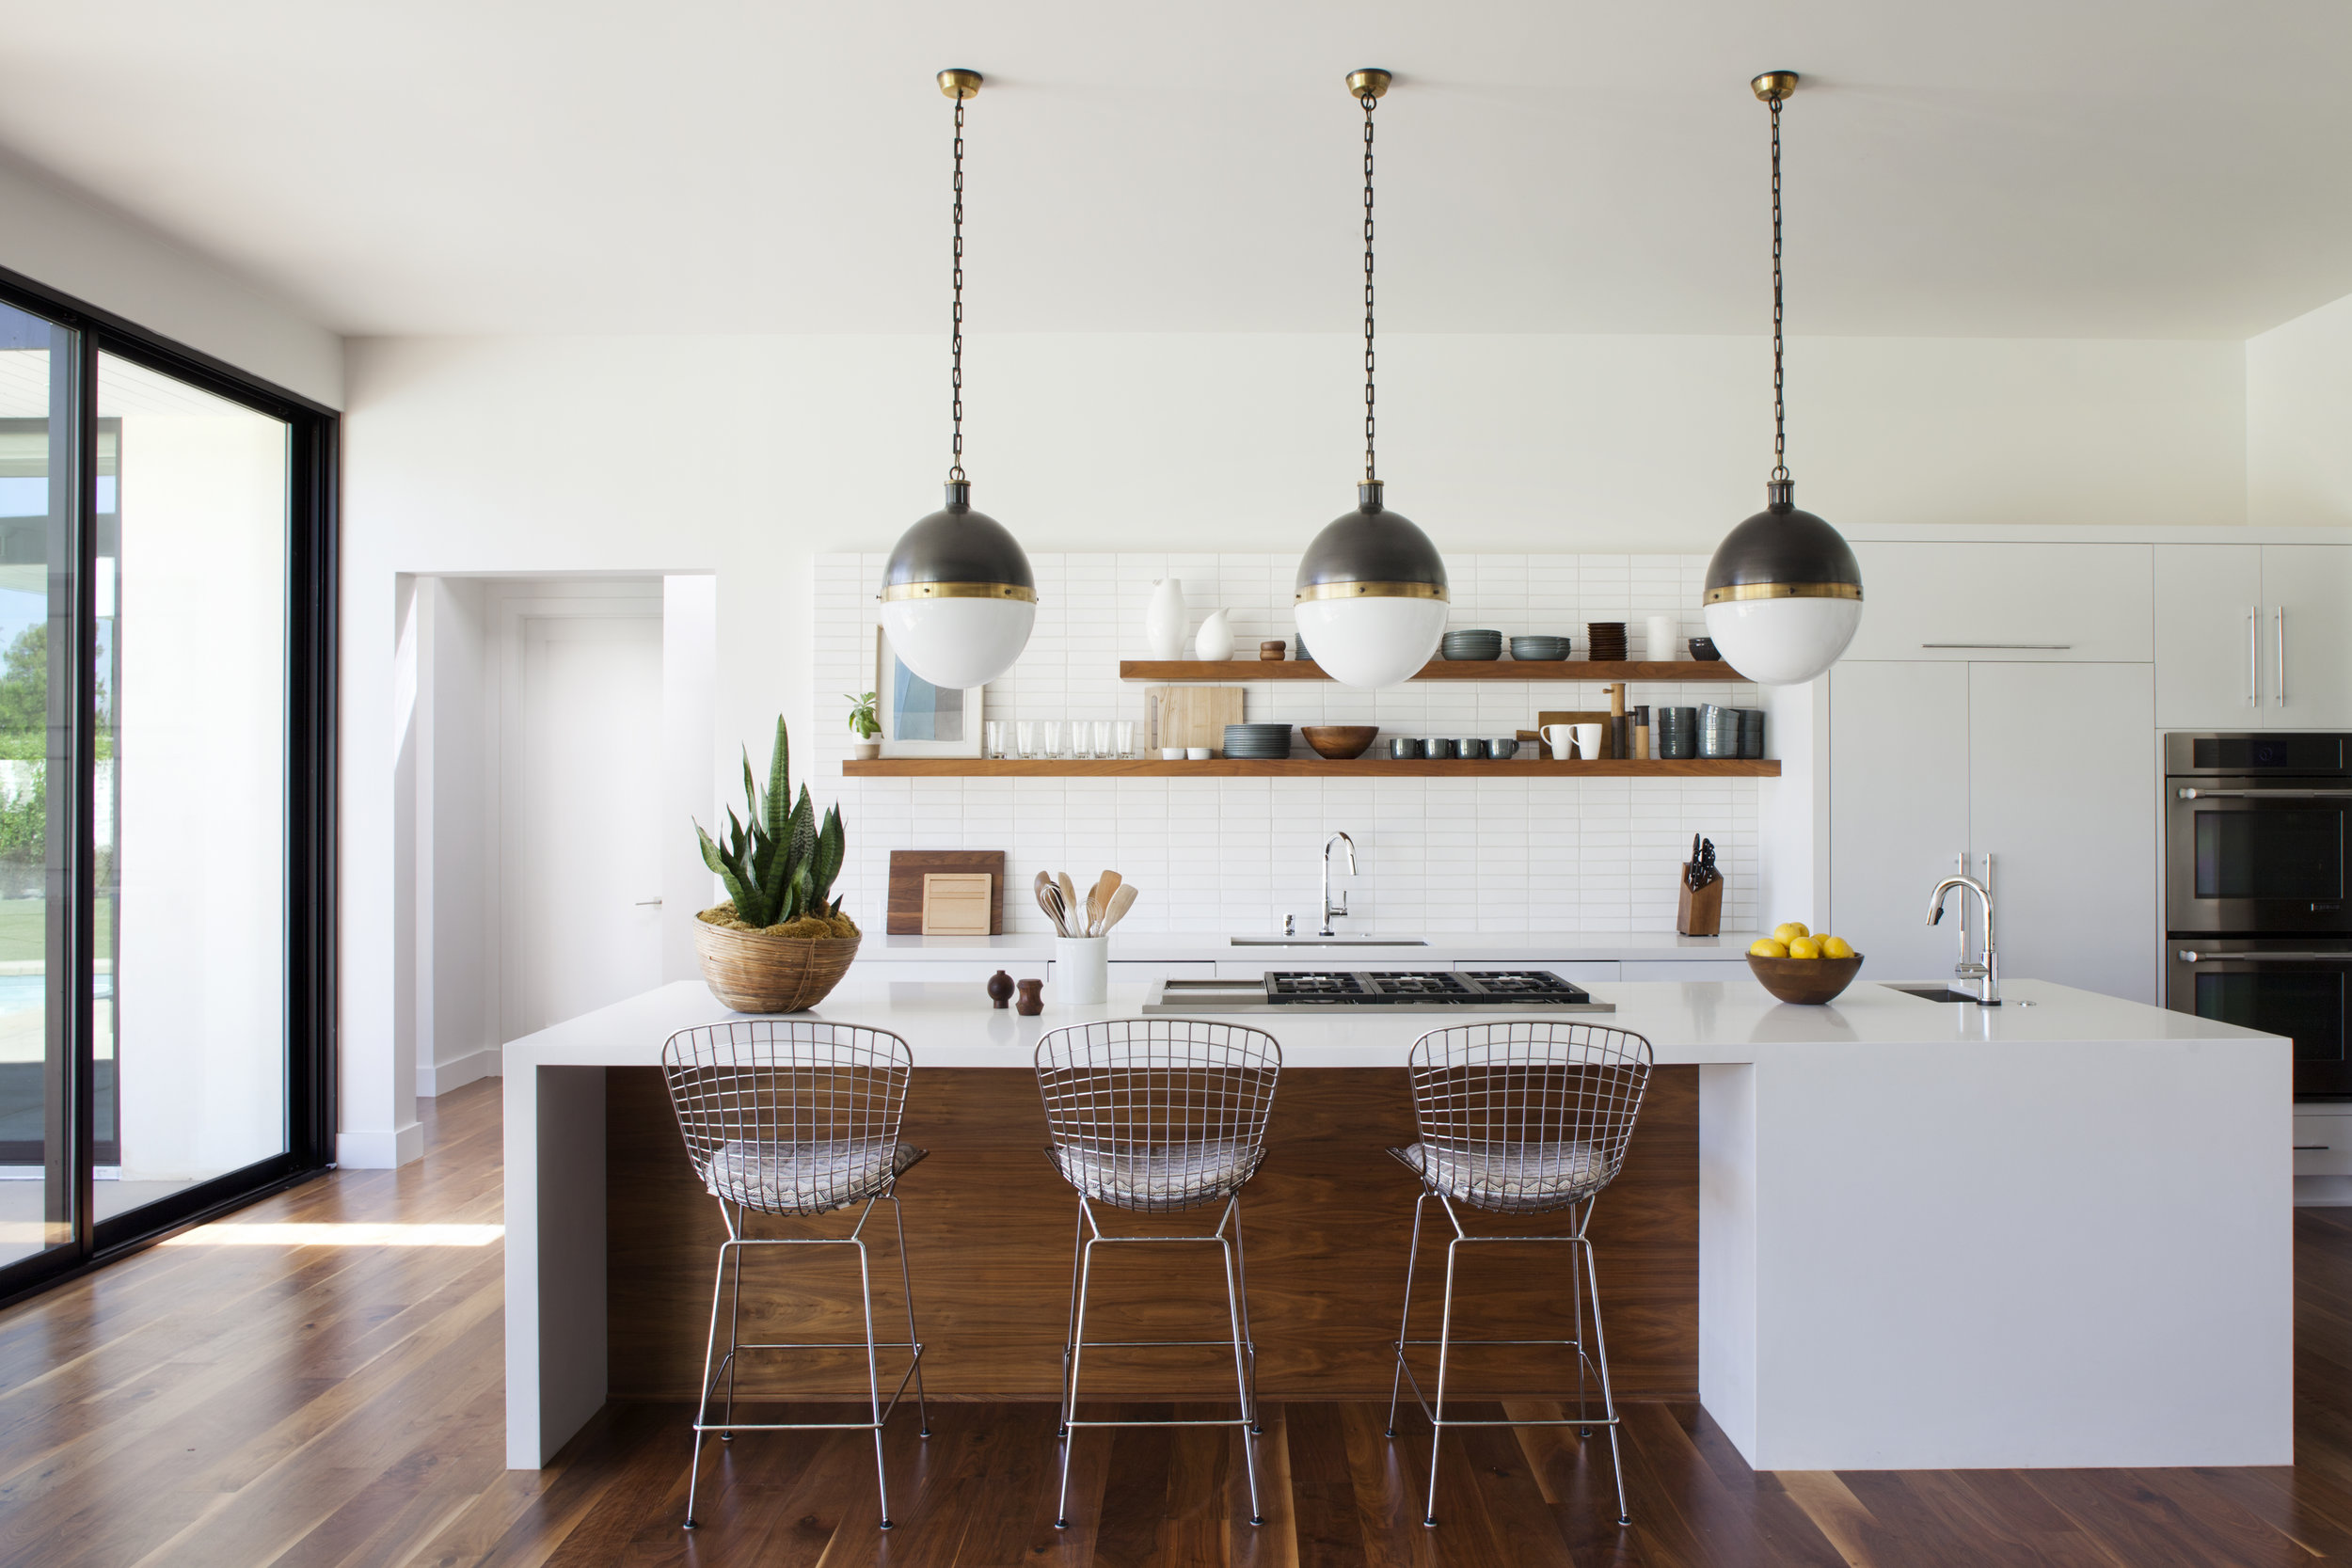 Retro Bliss Awaits Thanks to These Midcentury Modern Kitchen Lighting Ideas